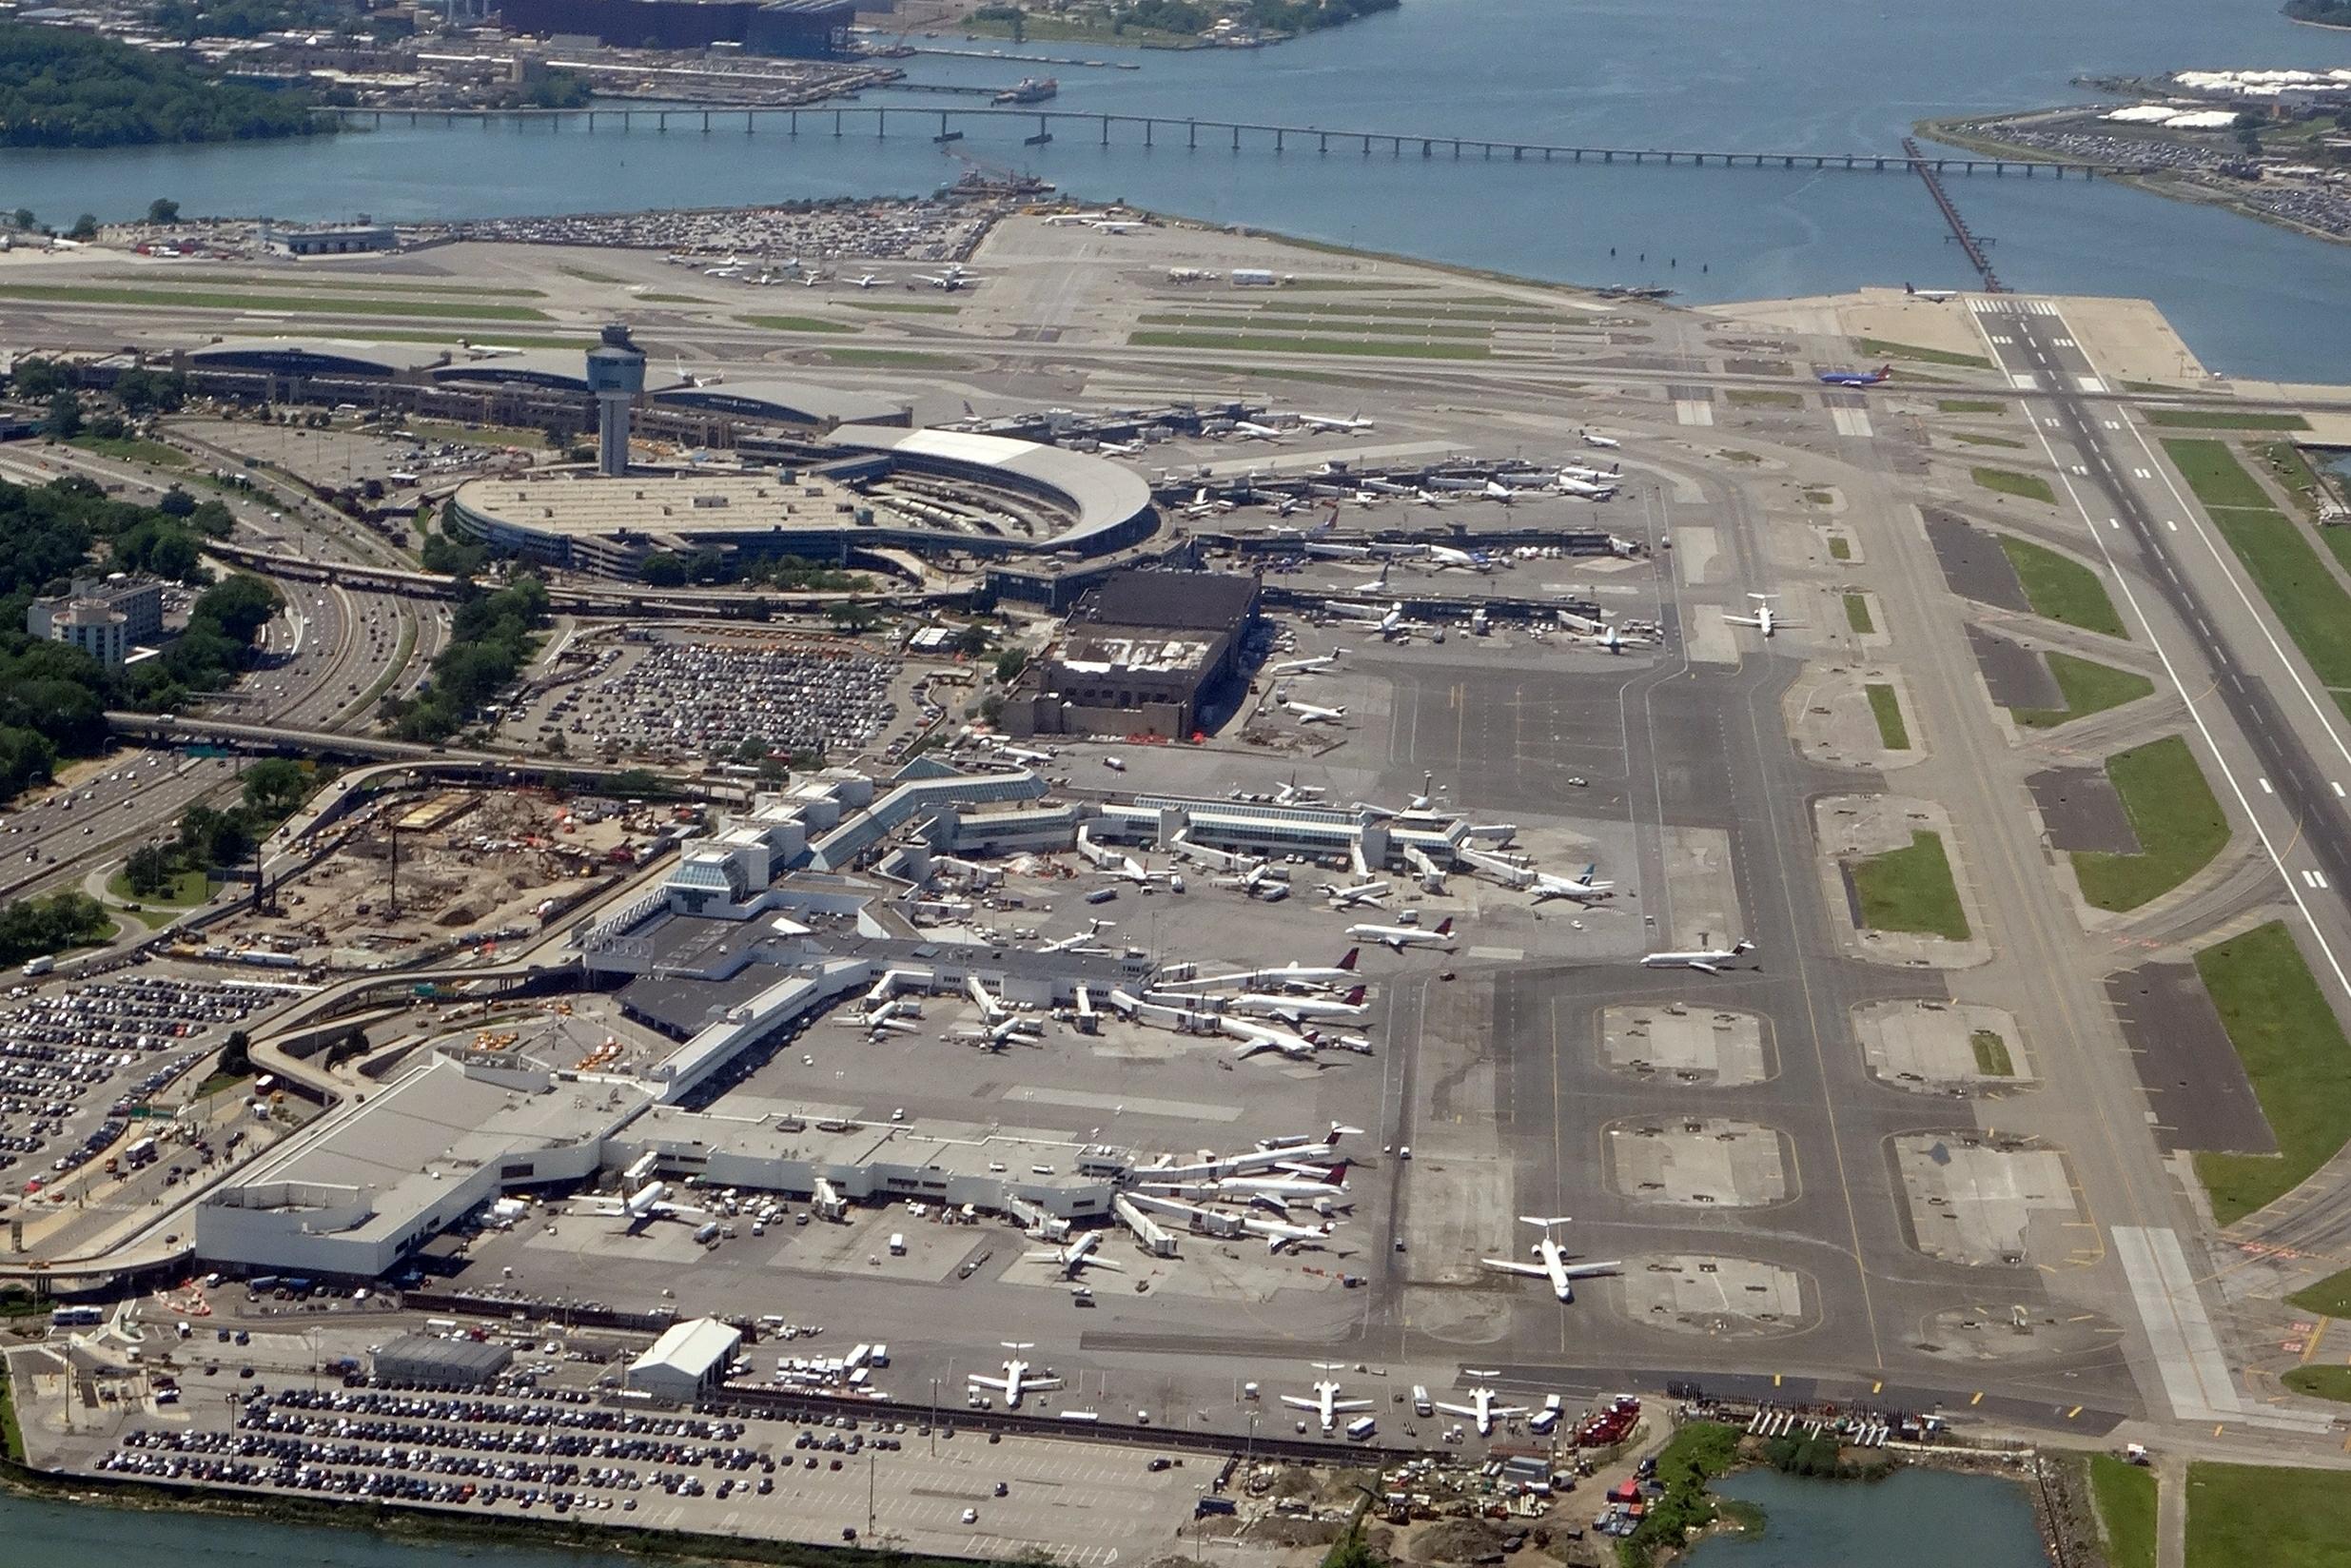 Aeroporto New York La Guardia : File lga airport la guardia new york from flight buf